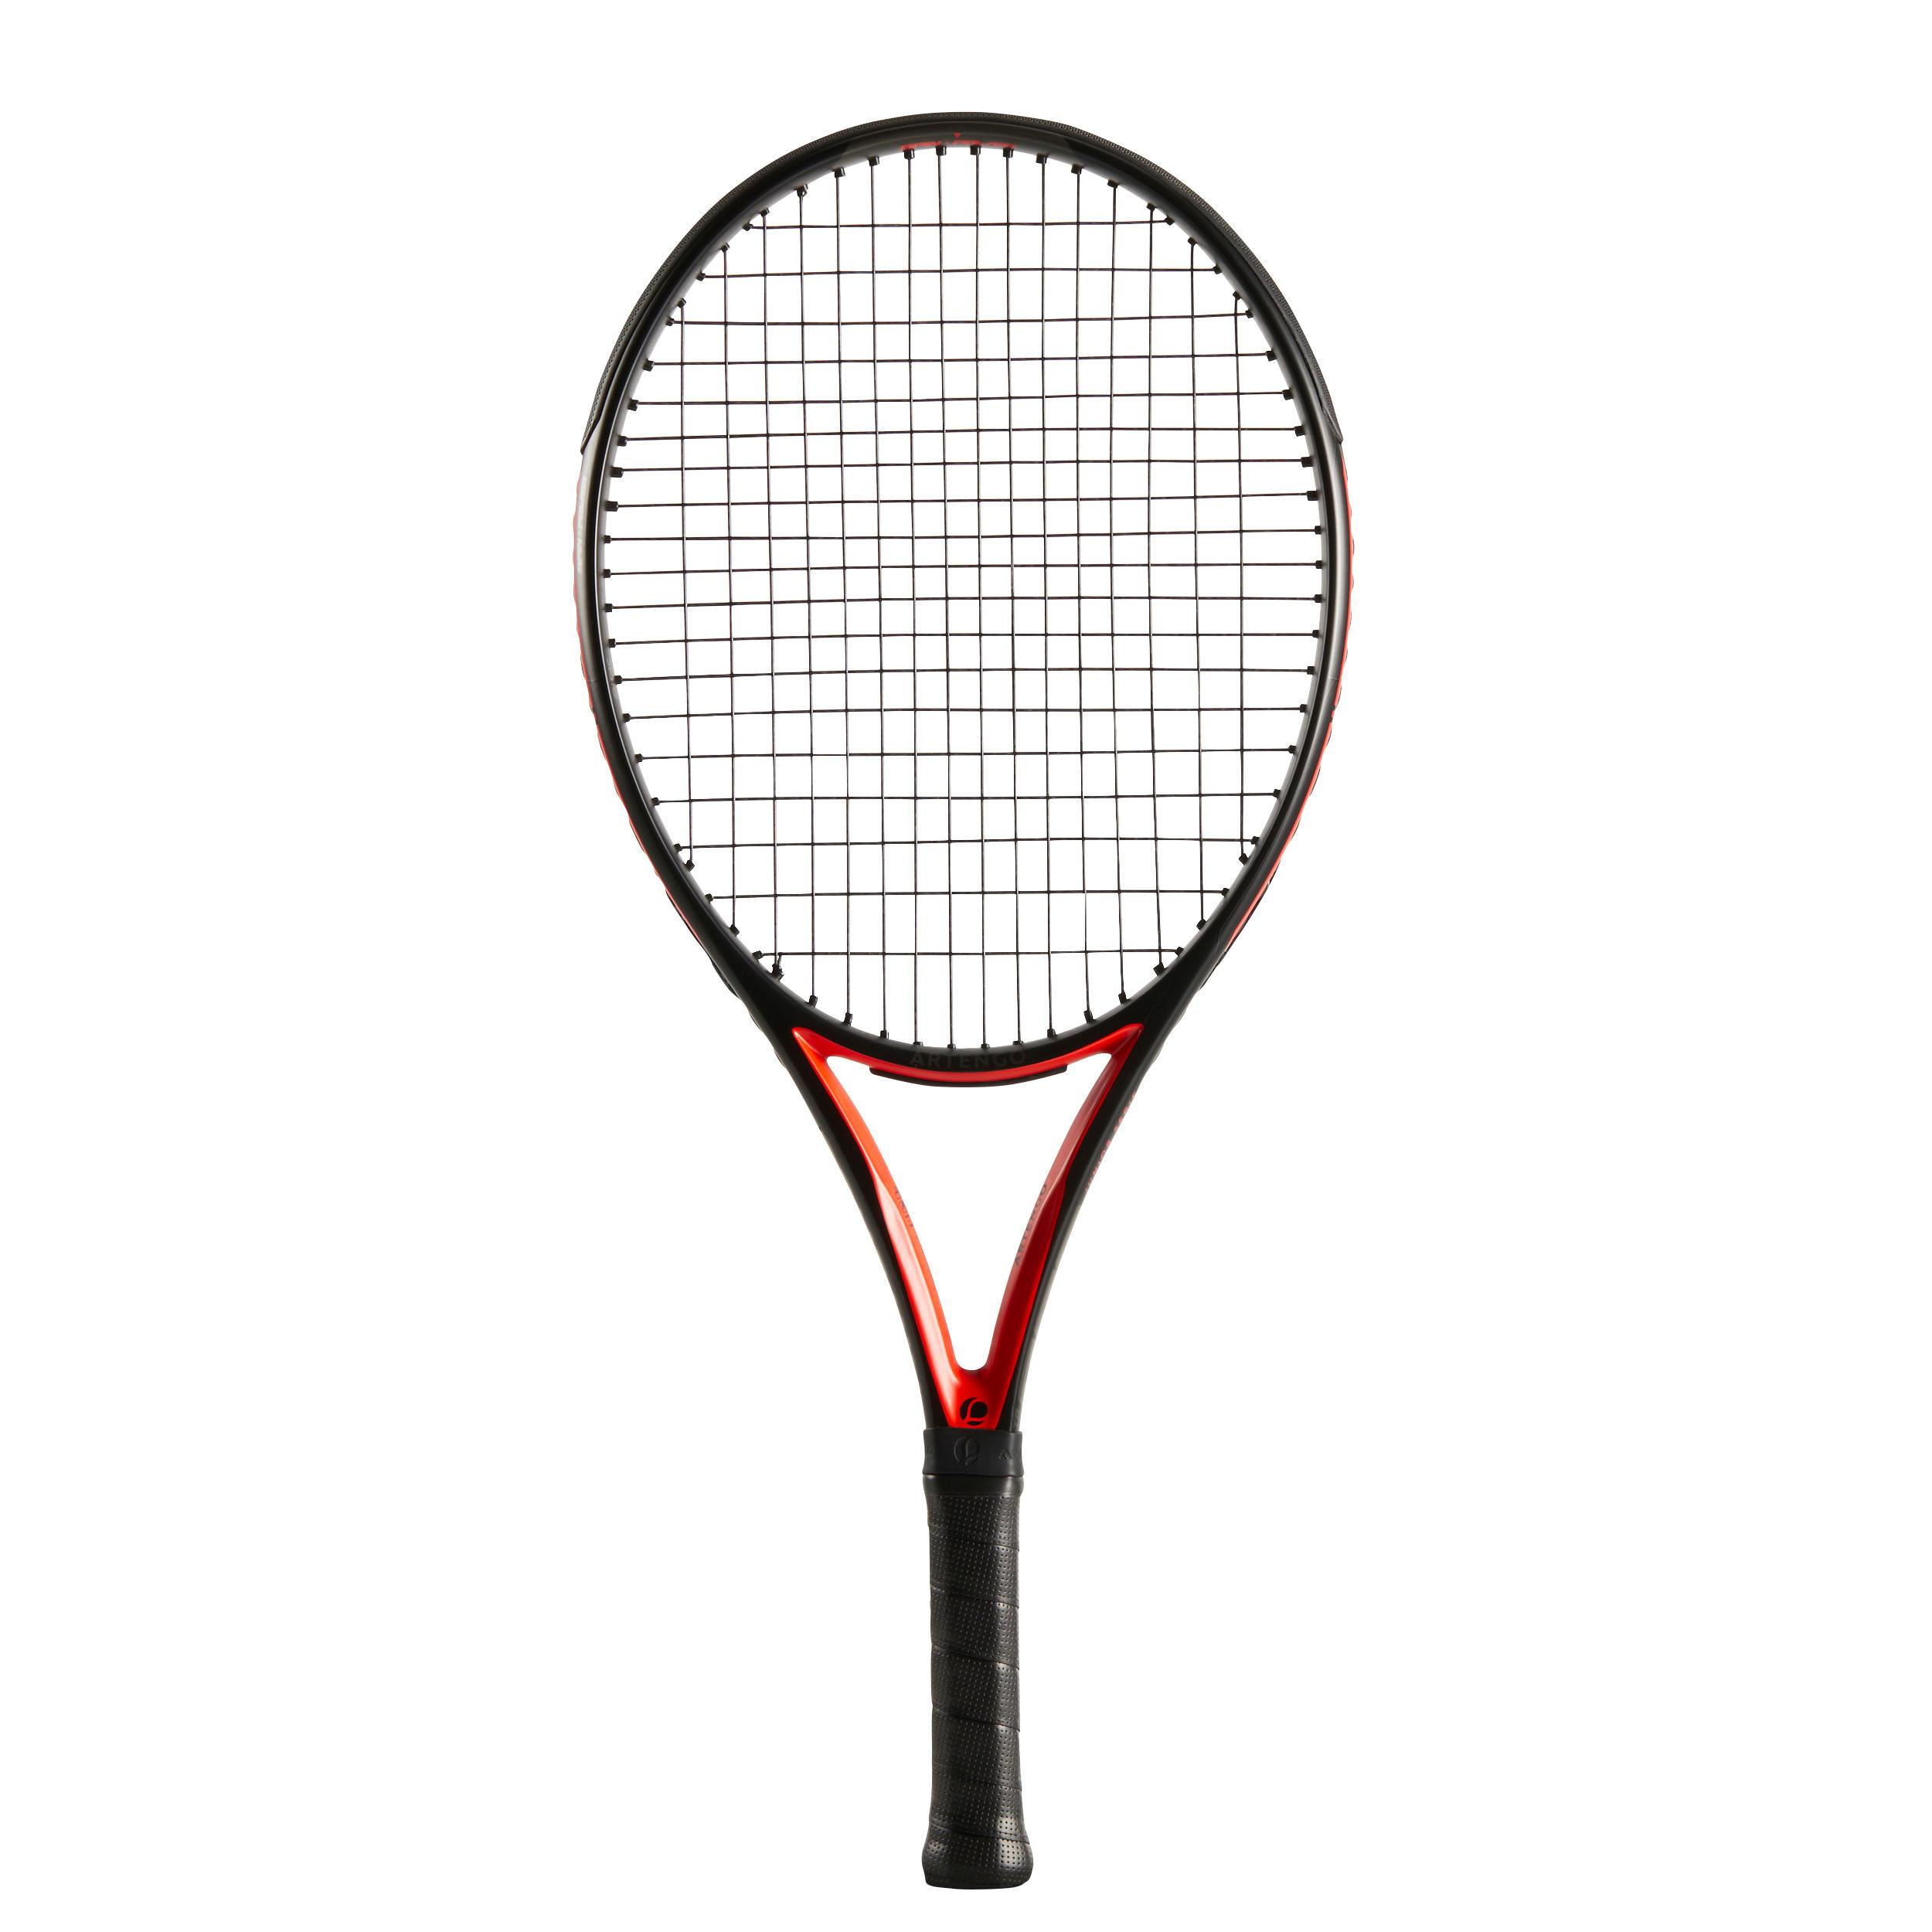 "Rachetă Tenis TR990 Power 25"" la Reducere poza"